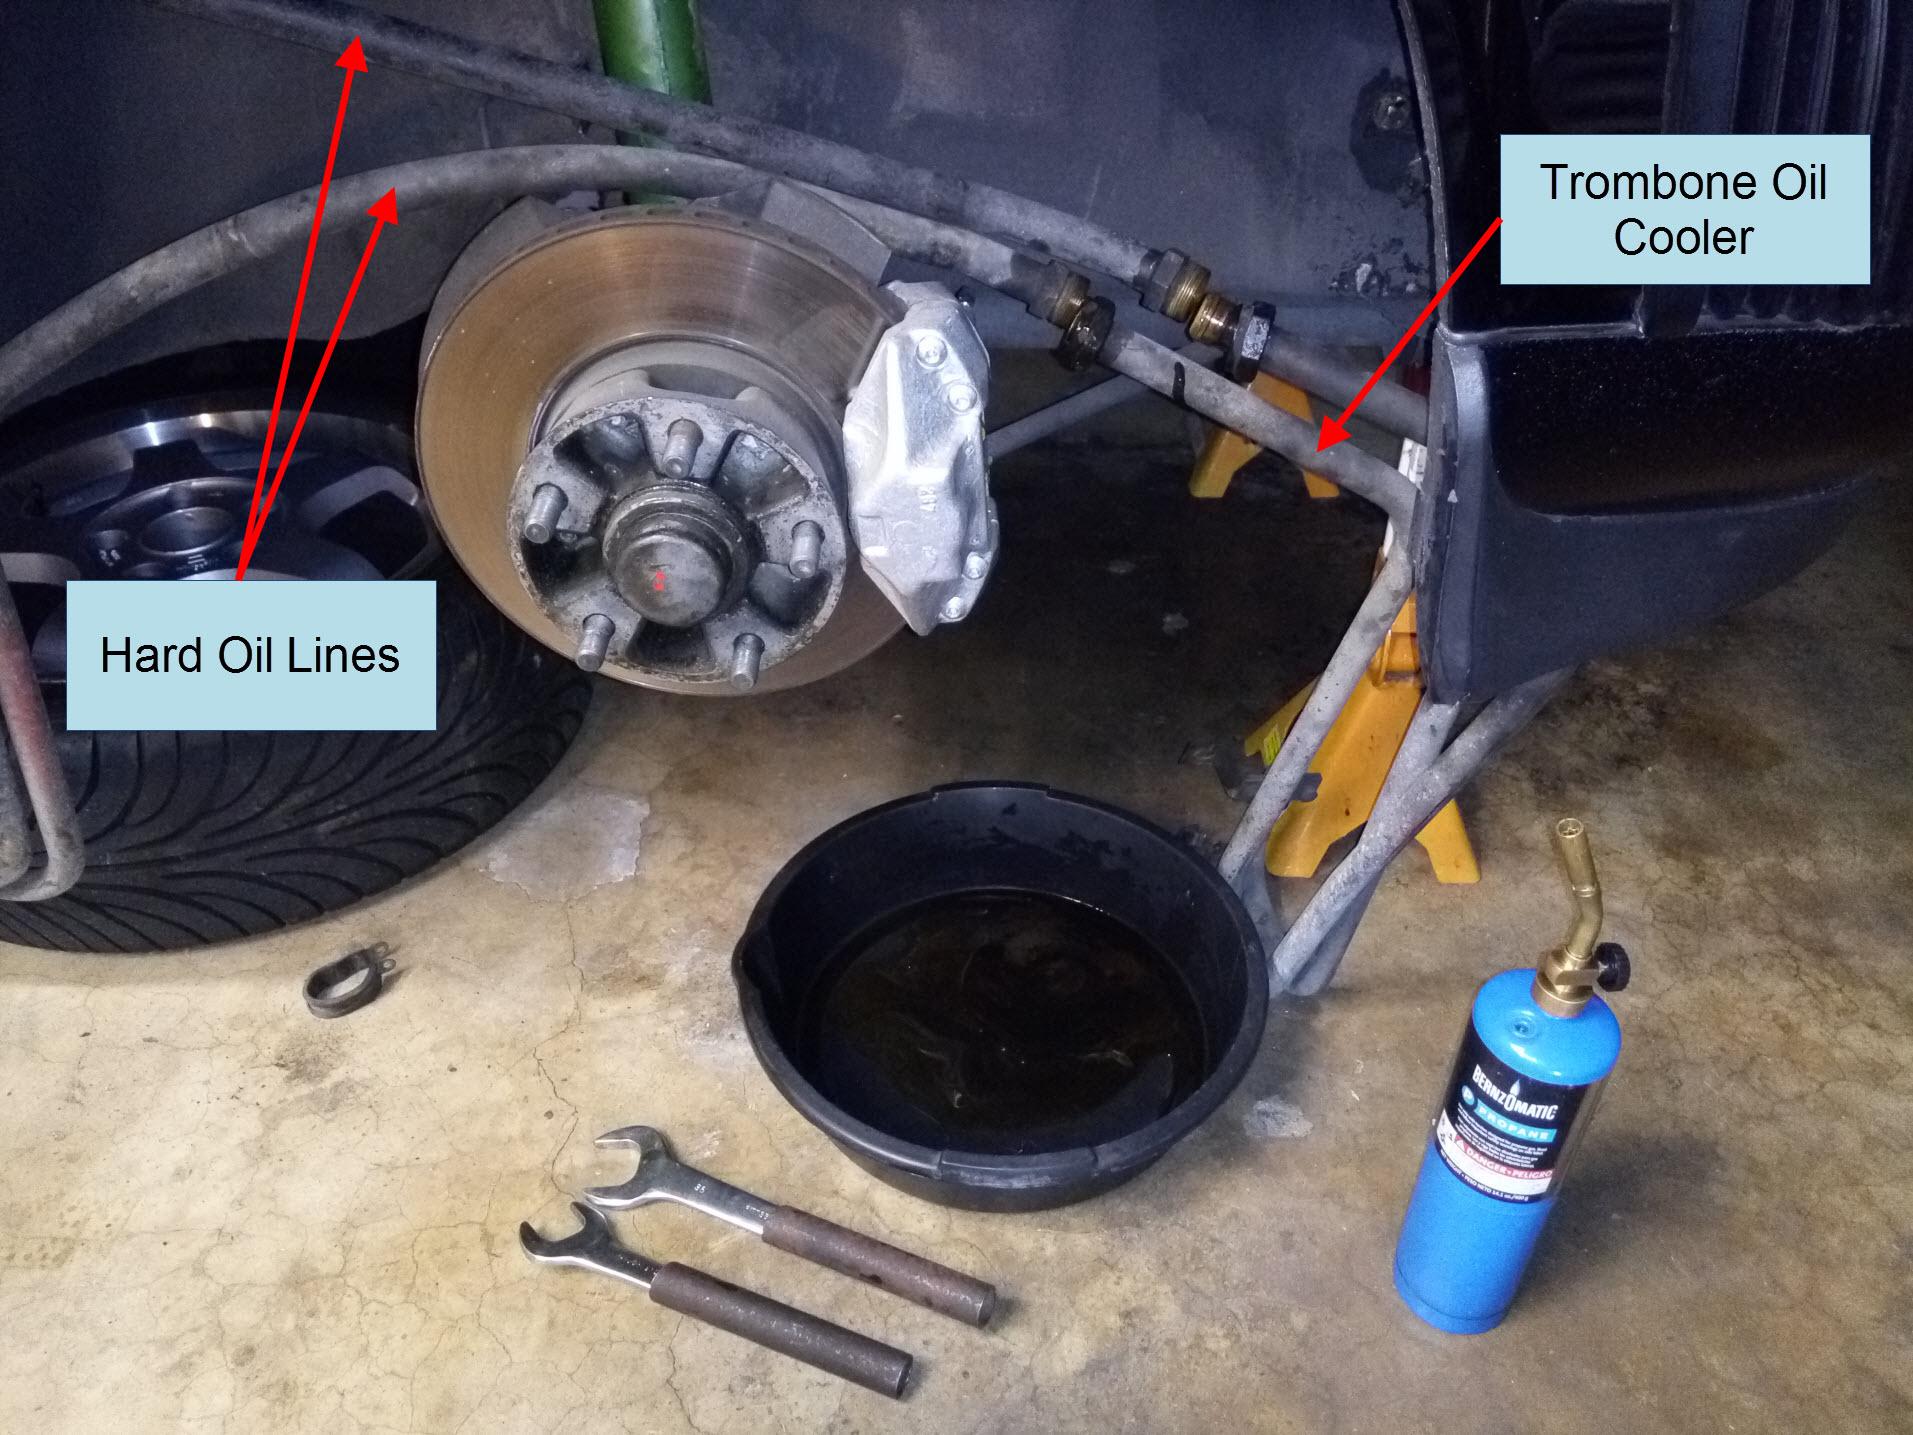 Air-cooled Porsche 911 trombone oil cooler removal.